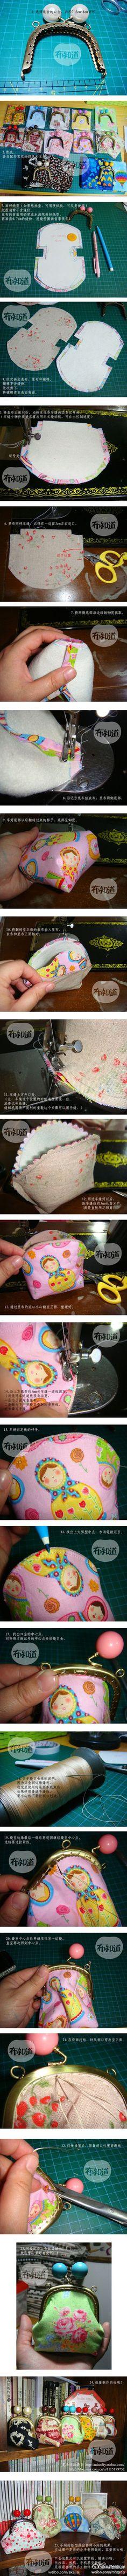 Make a petite coin purse.: